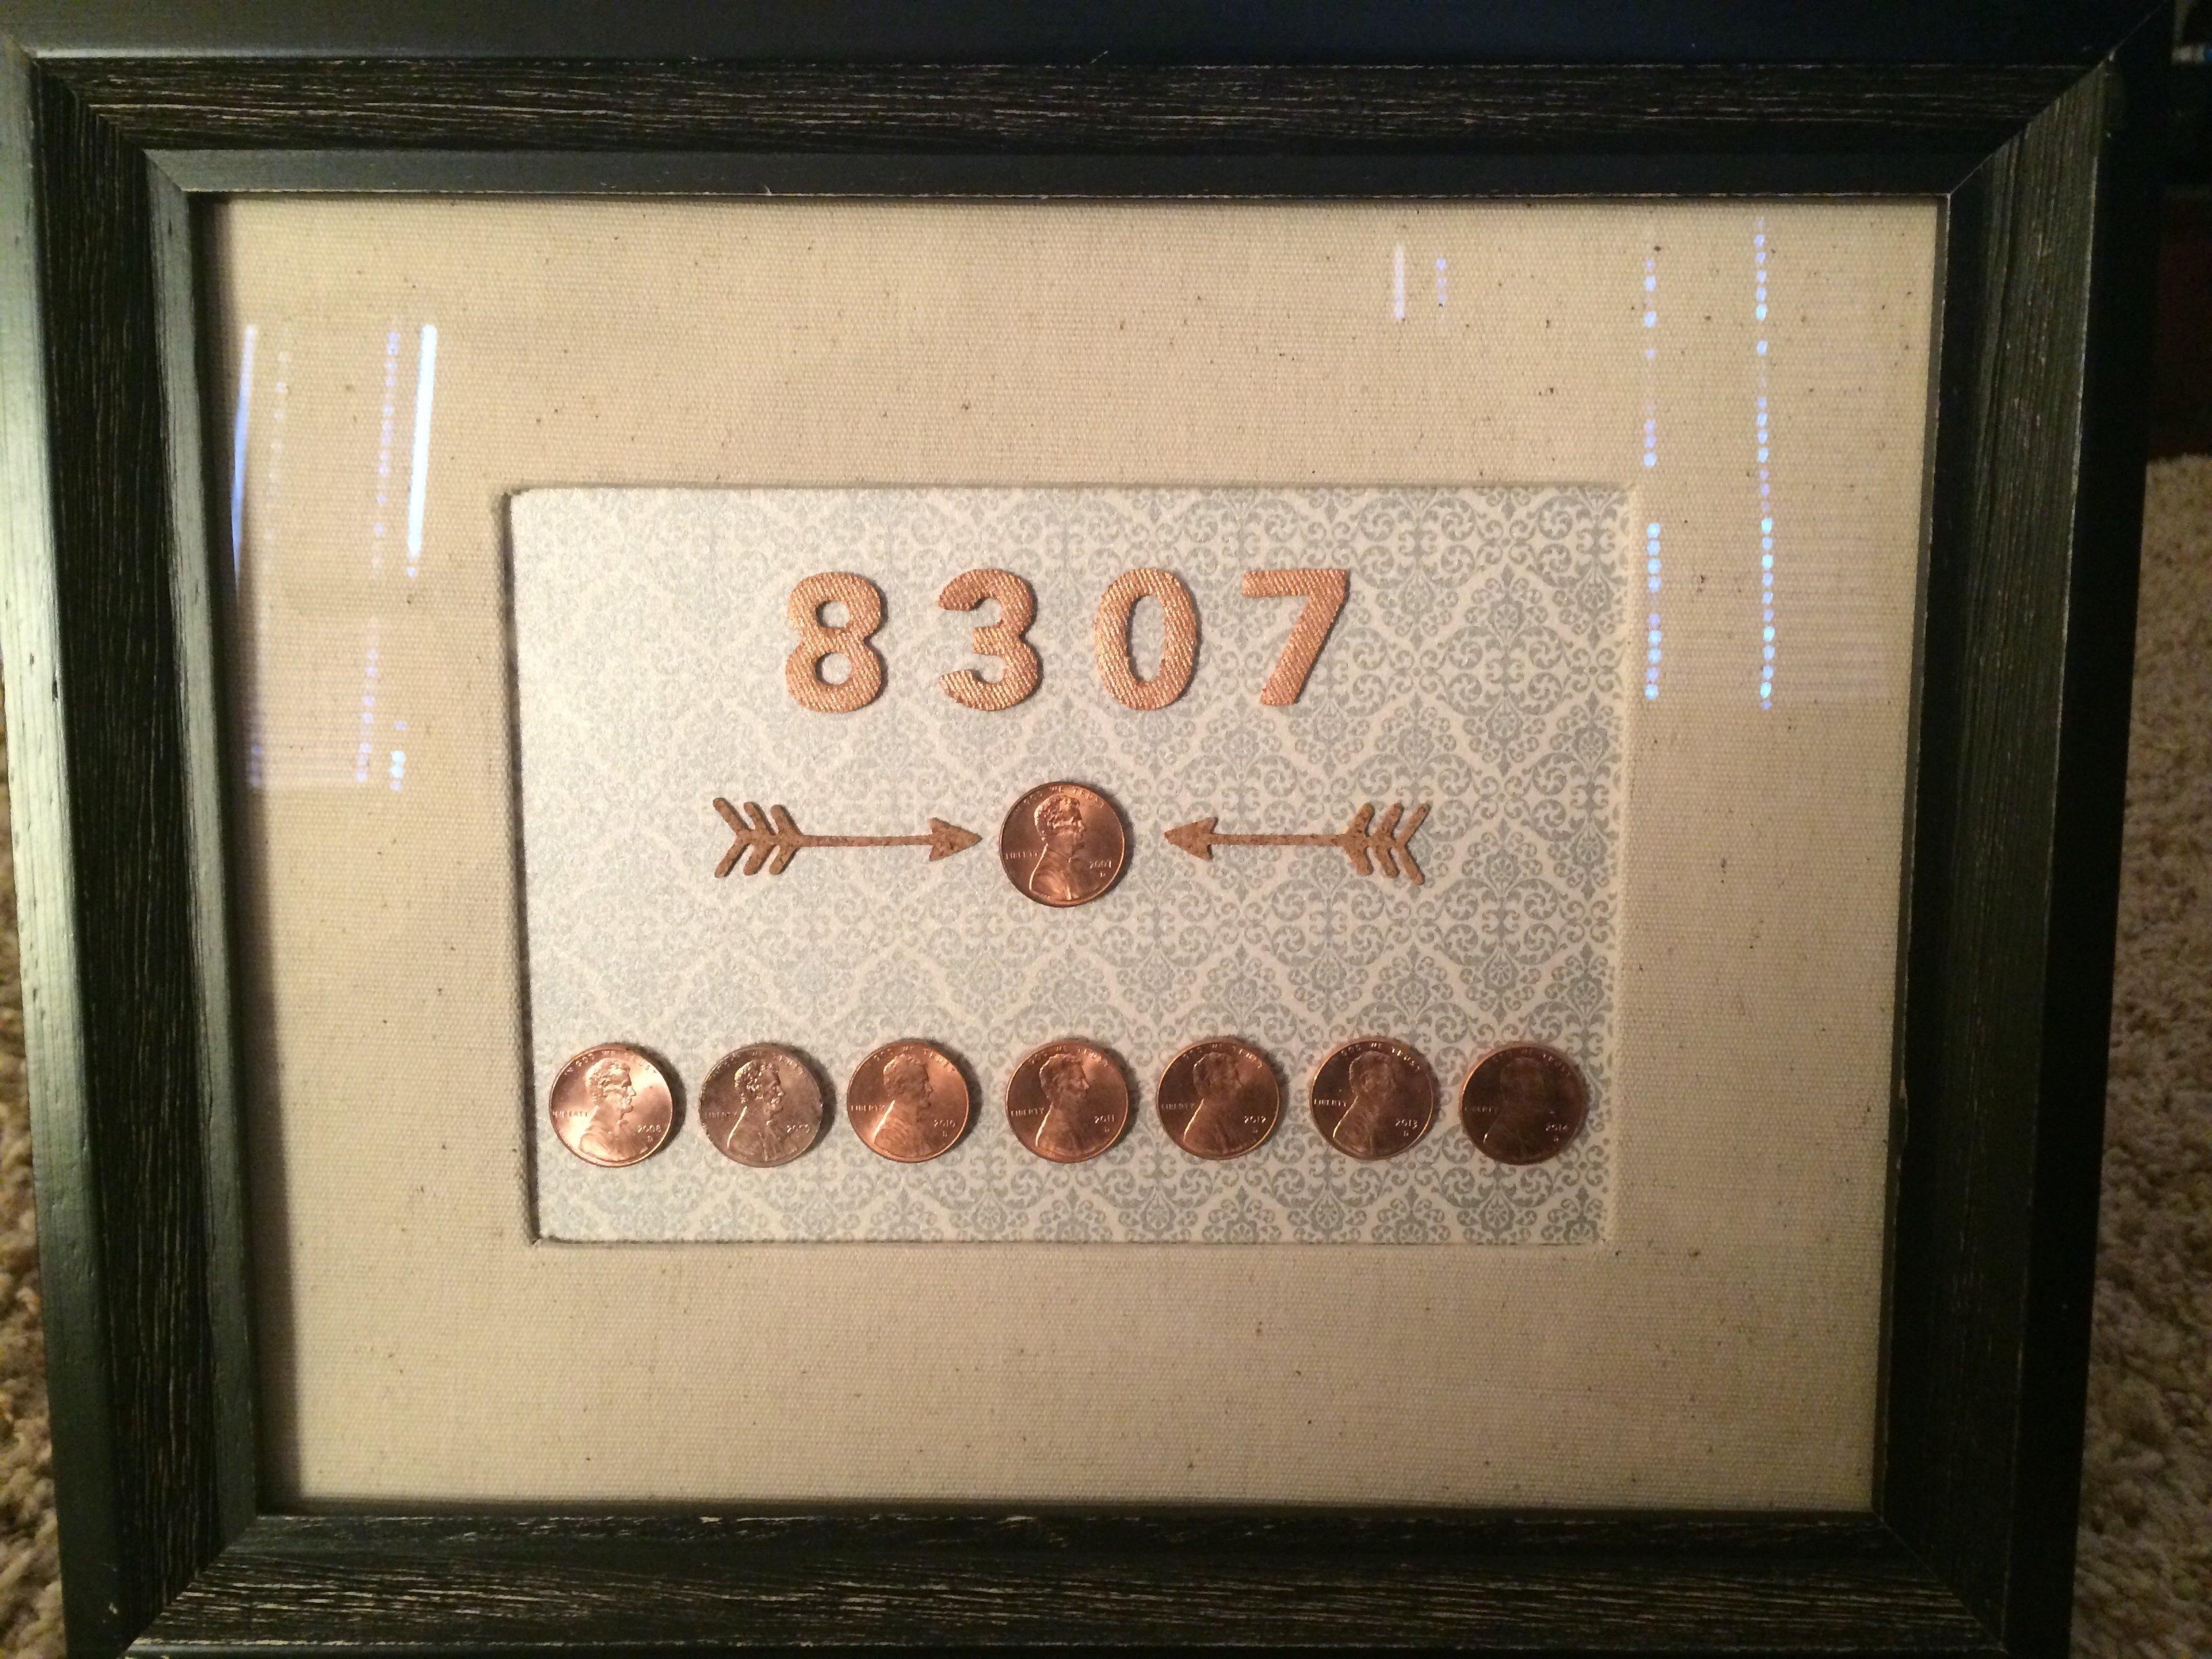 10 Stylish Copper Gift Ideas For Him seventh wedding anniversary giftspiritknit on instagram 1